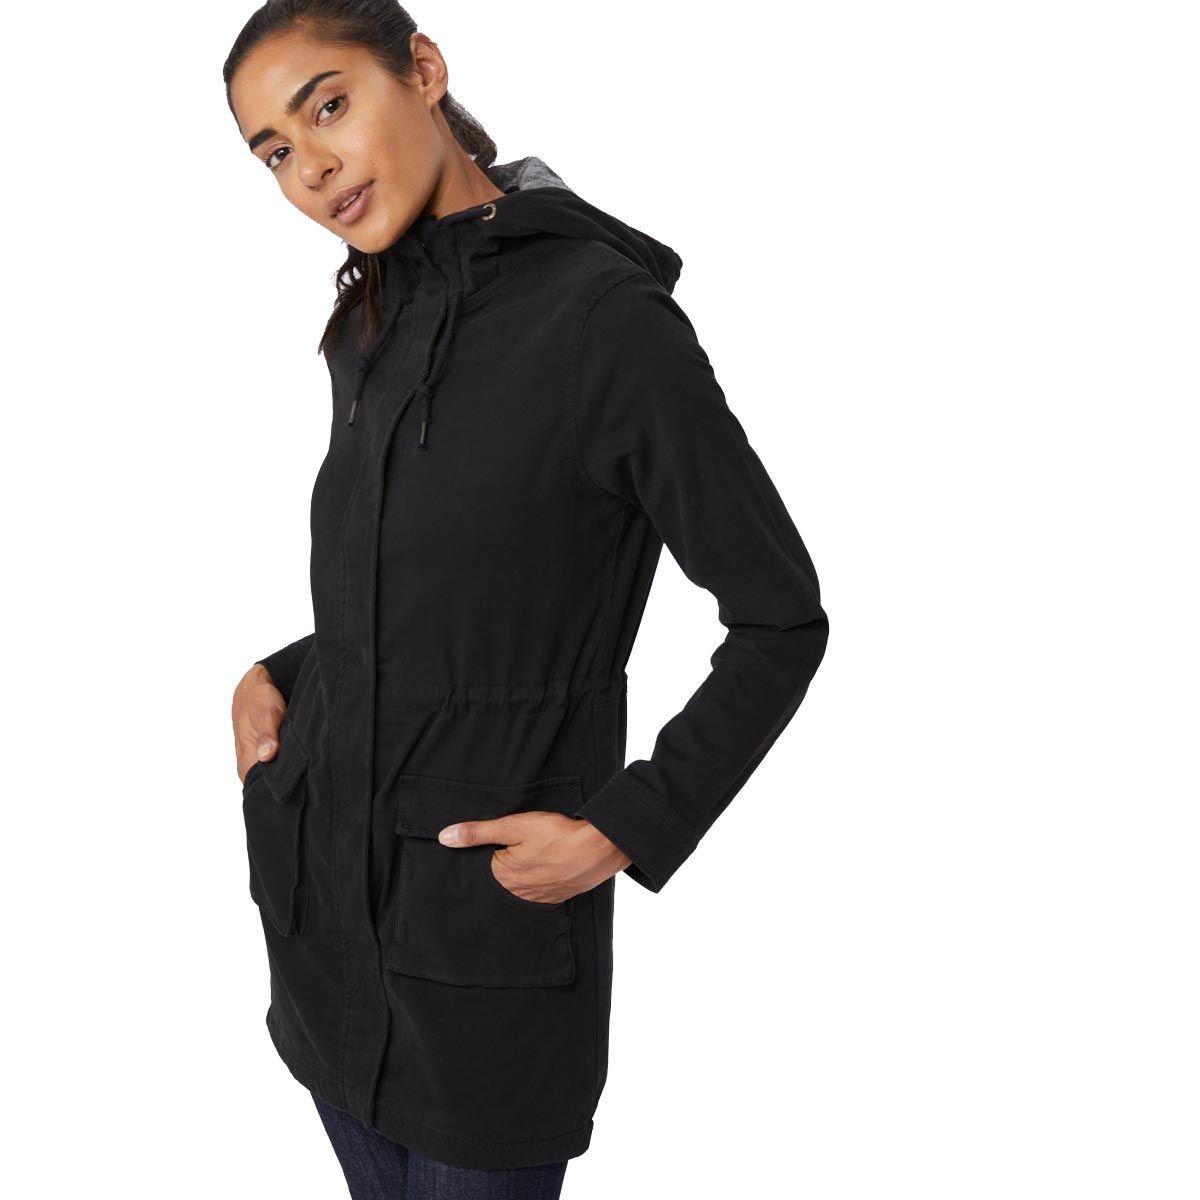 Tentree Women S Conifer Jacket Free Shipping Jackets Outerwear Jackets Jackets For Women [ 1200 x 1200 Pixel ]